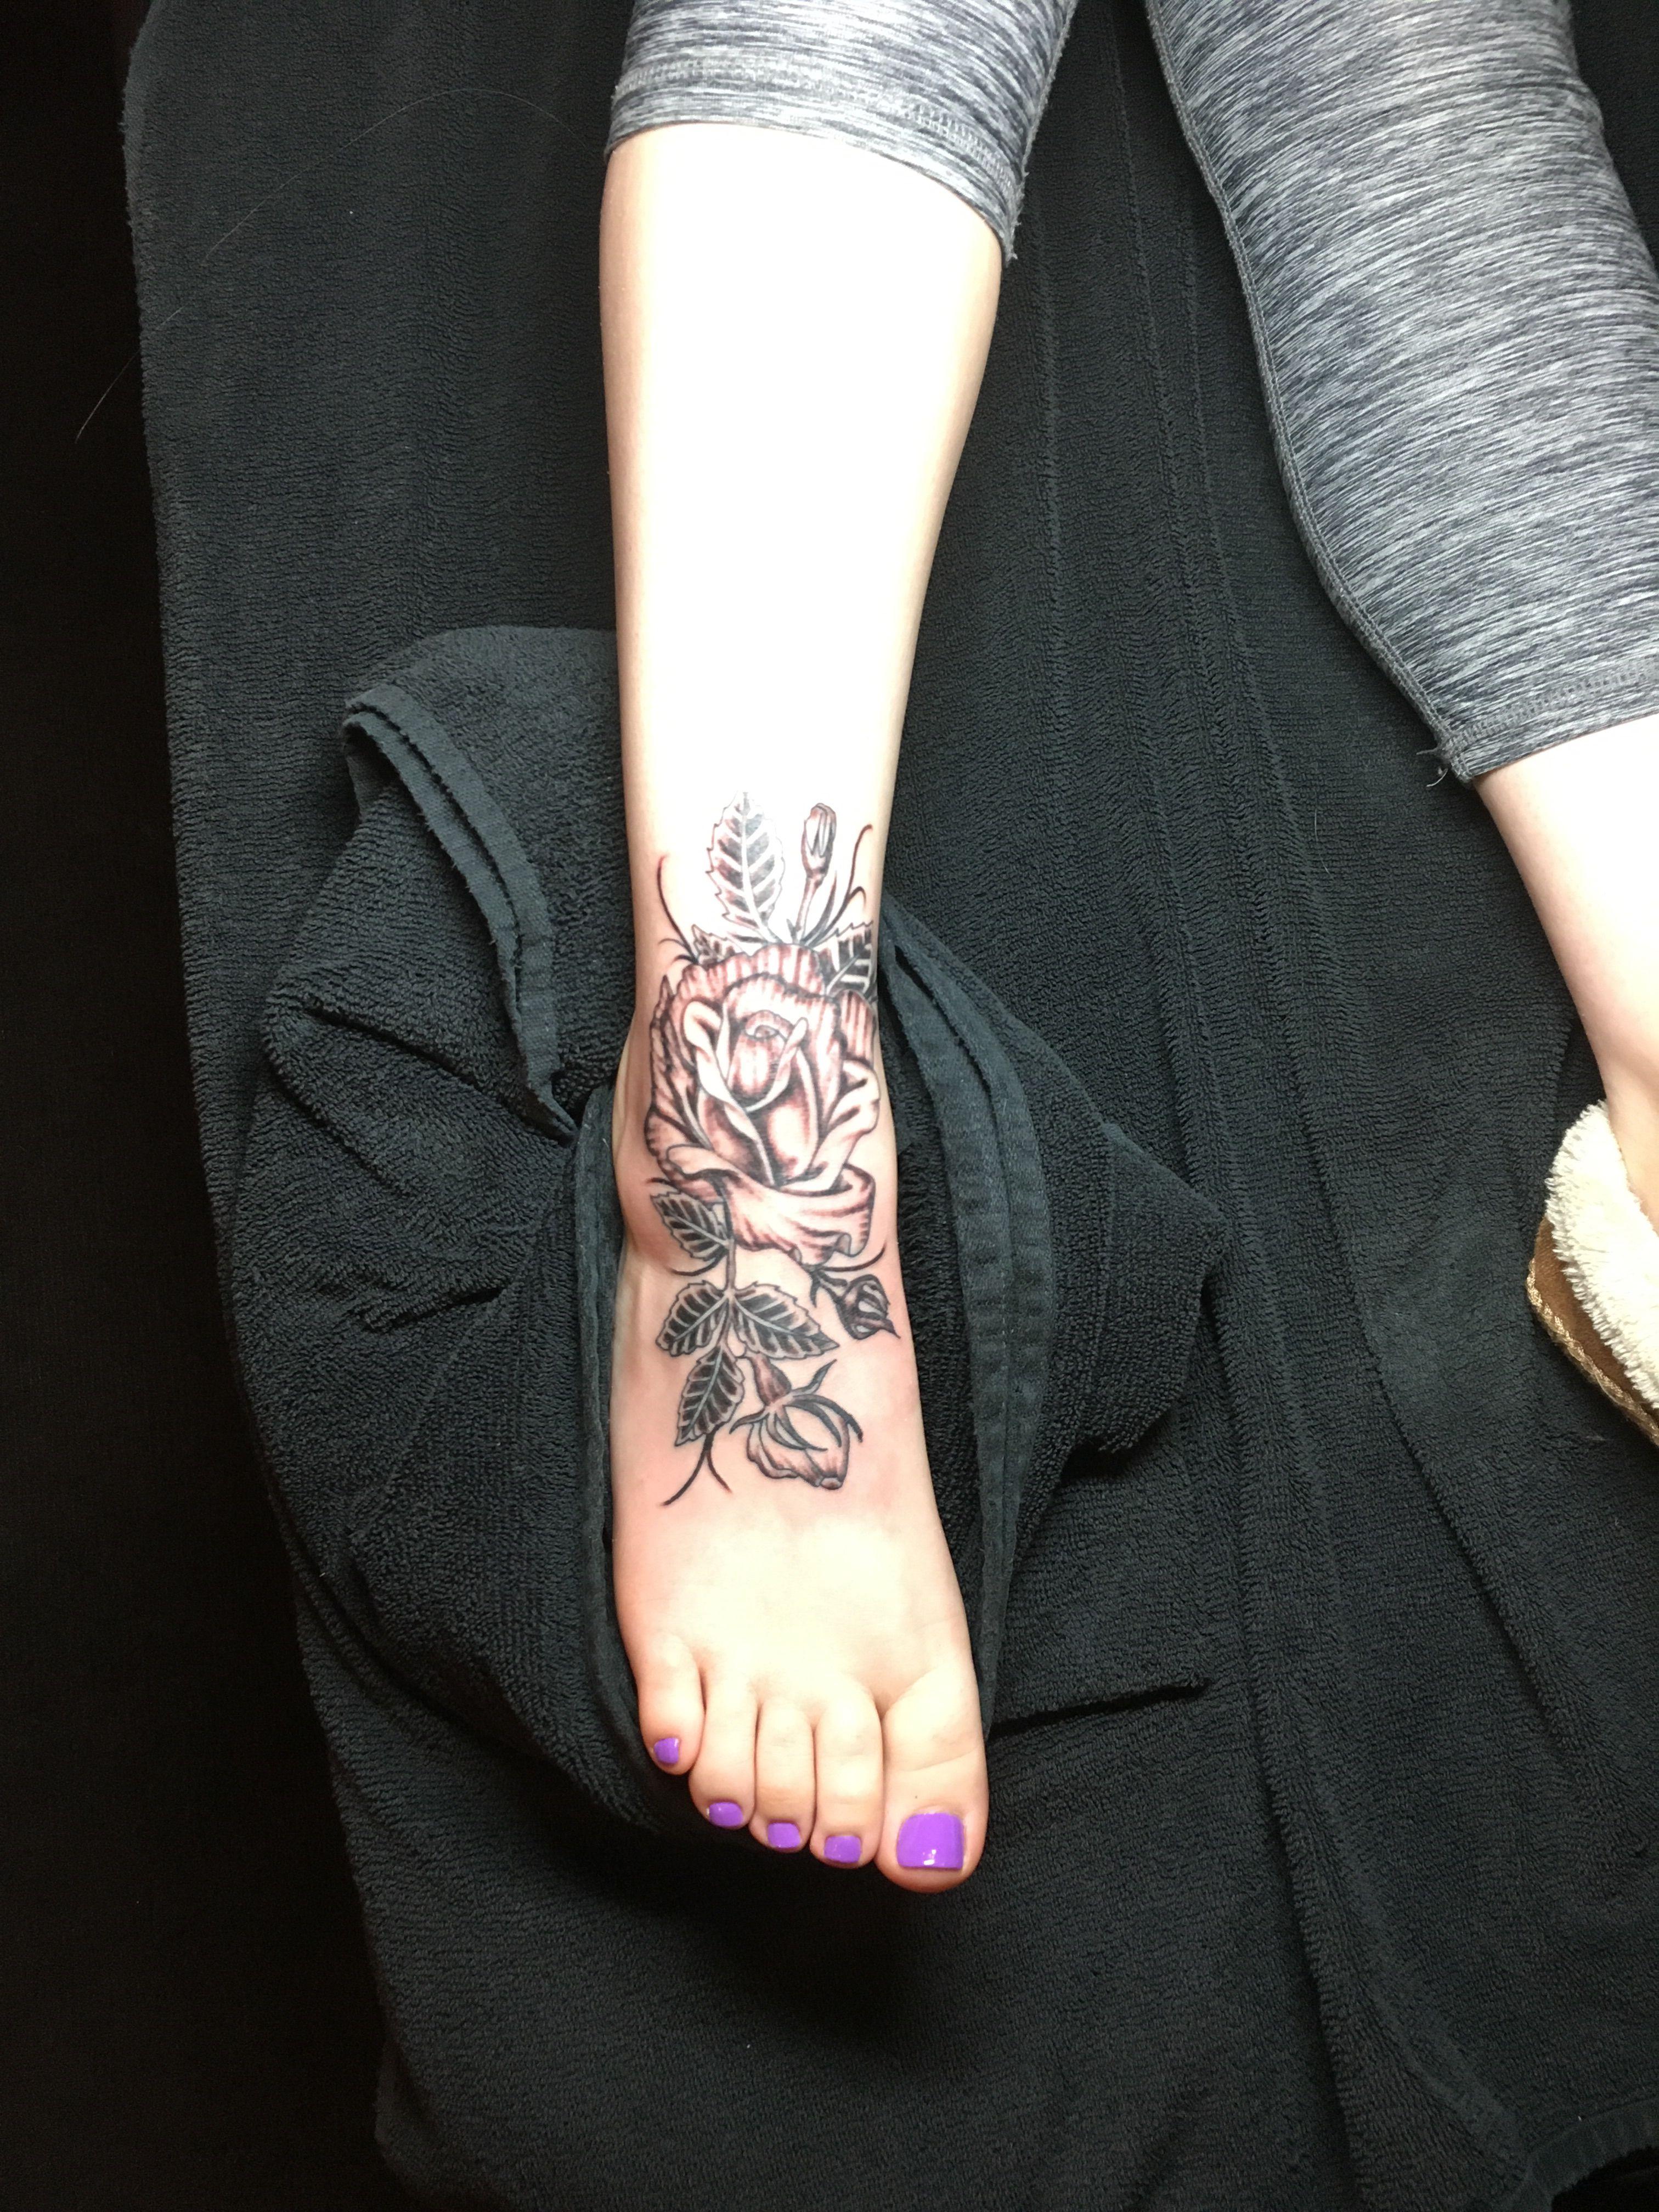 #tattoo #style #art #love #rose #flowertattoo #rosetattoo #tattoos #tattoodesign #blackandwhite #foottattoo #ankletattoo